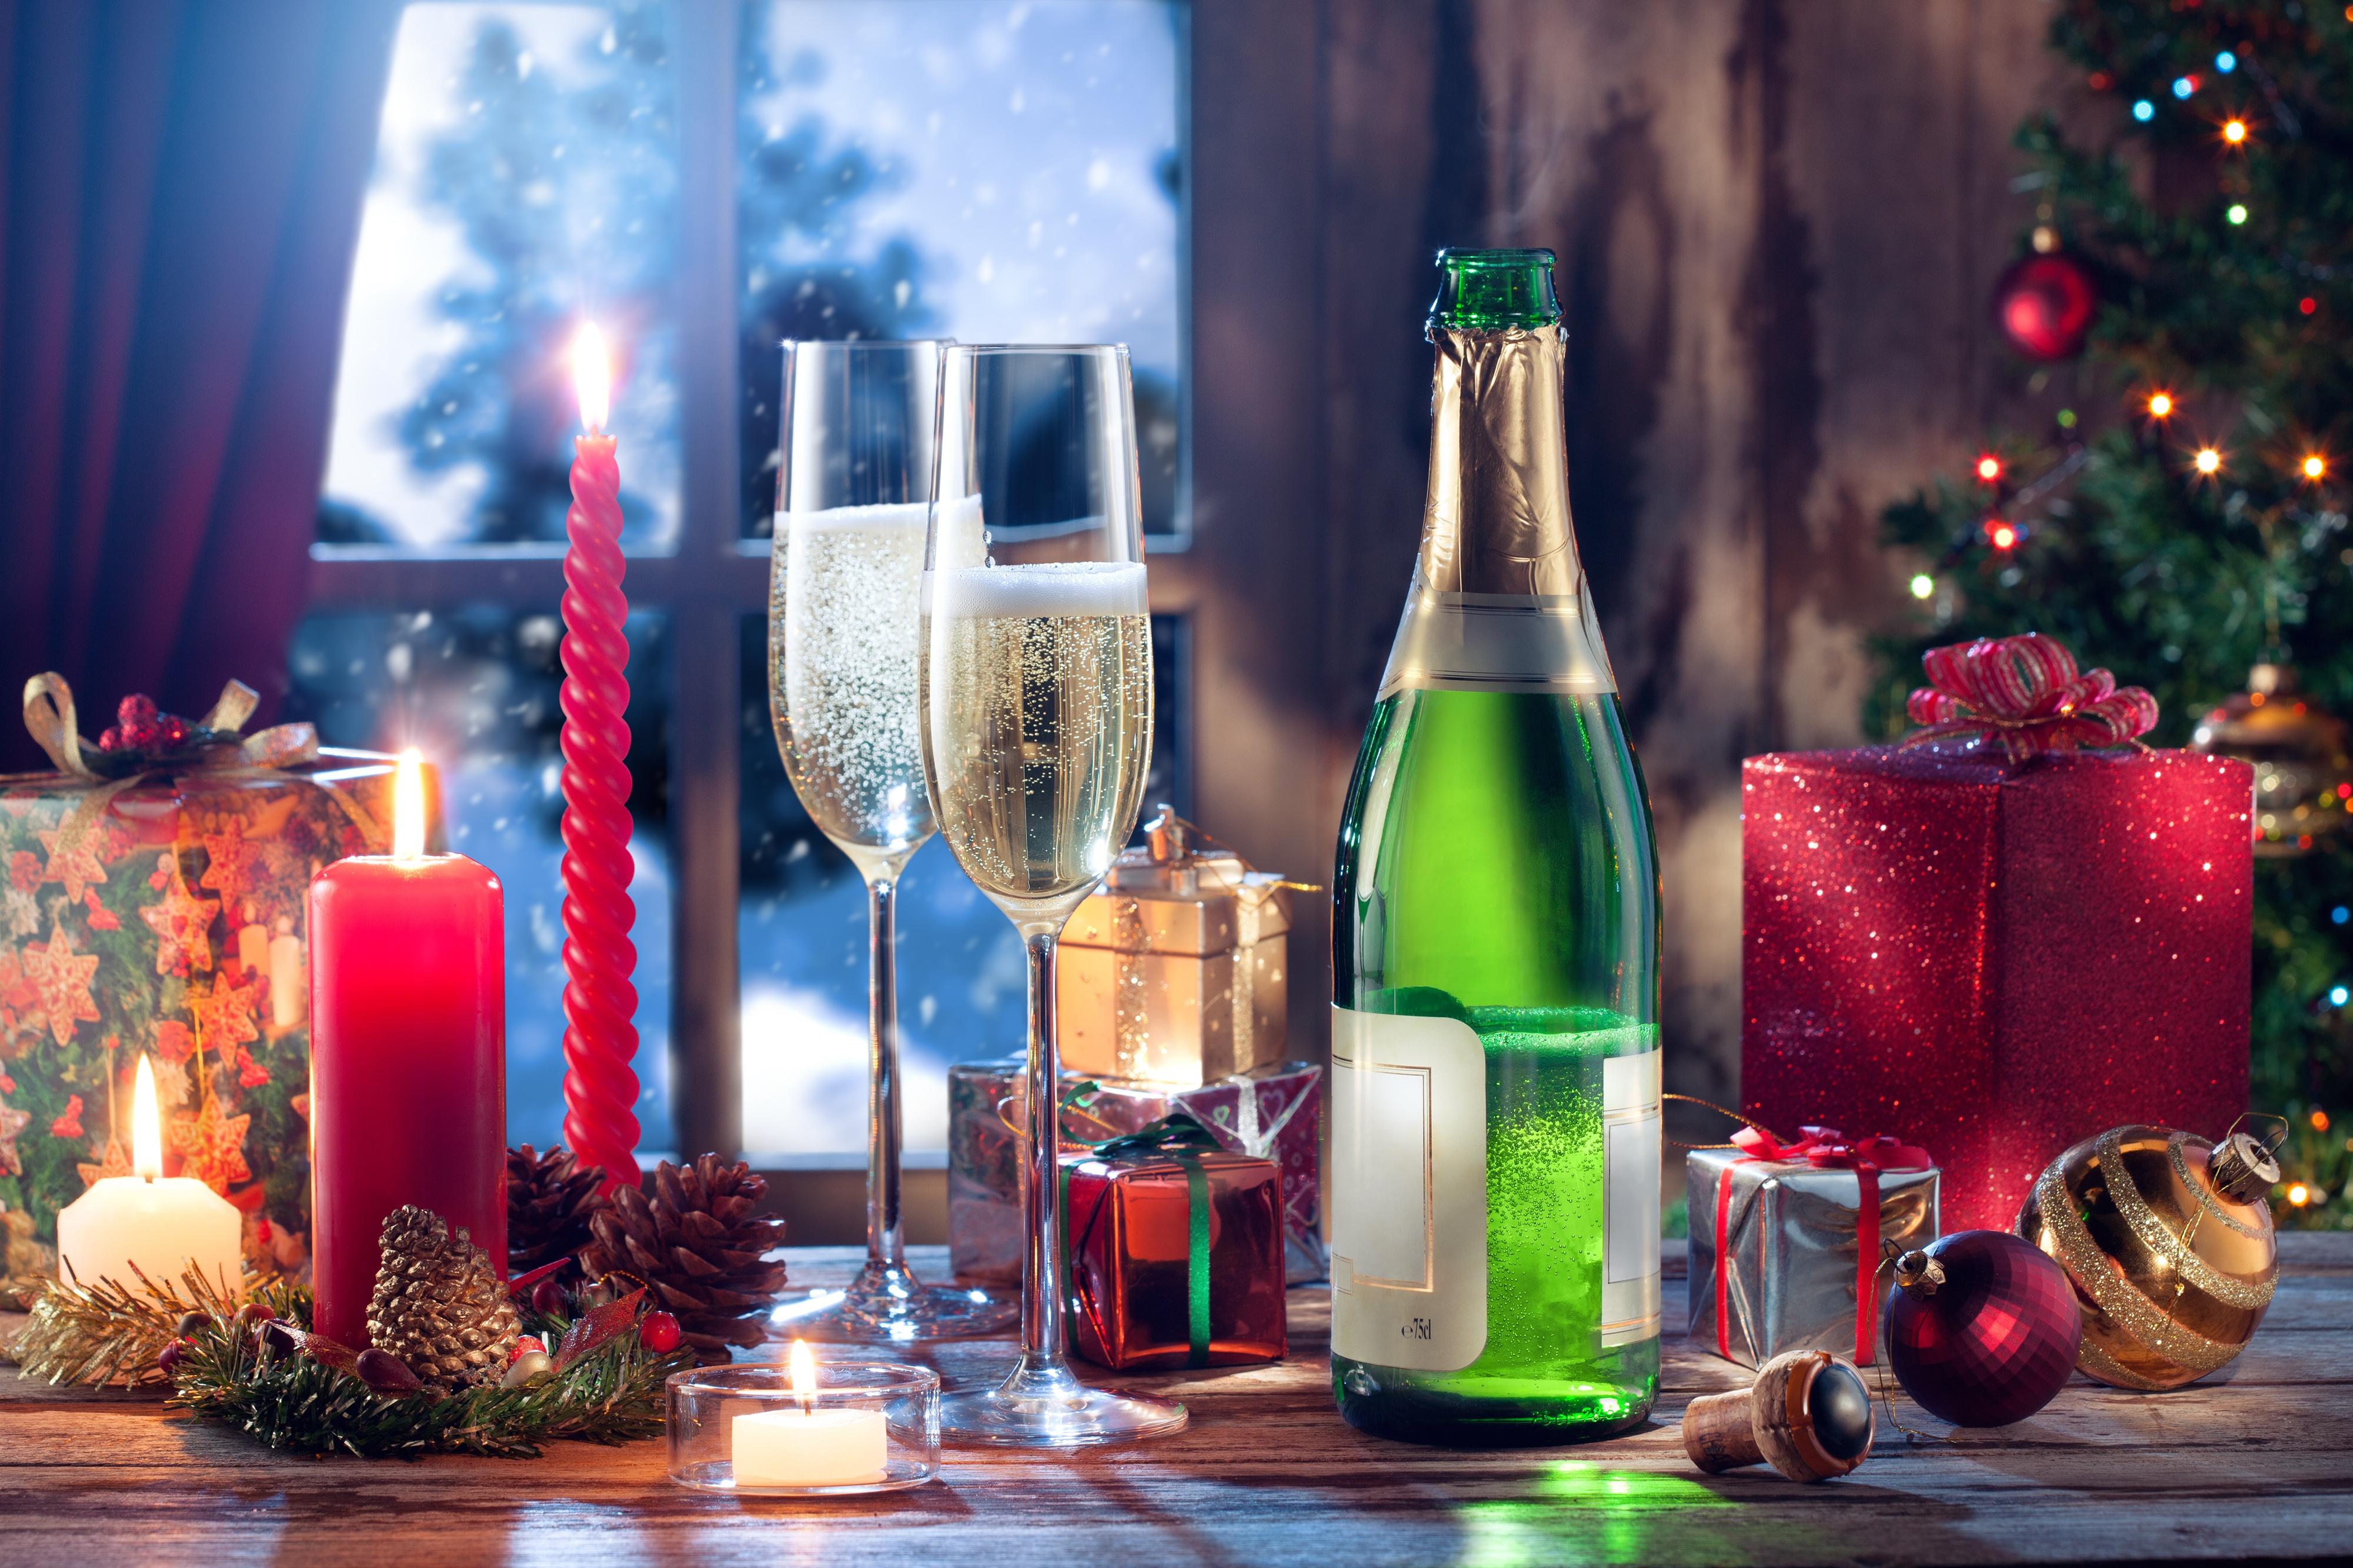 Открытка свечи шампанское, завтрак саду картинка